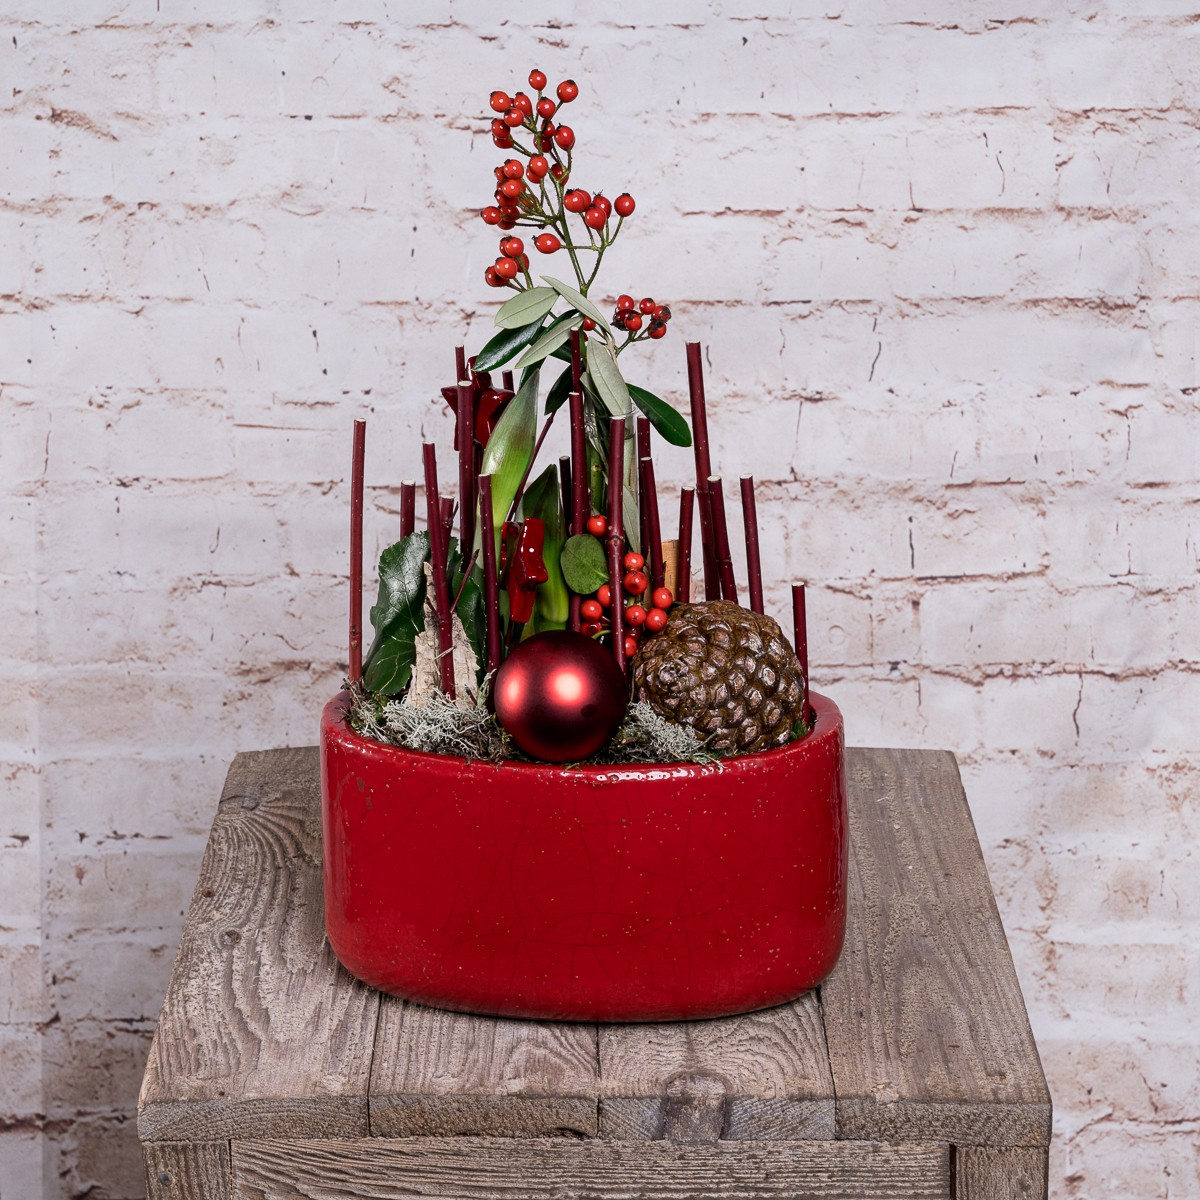 Dekorative Amaryllis im roten Topf Bild 1